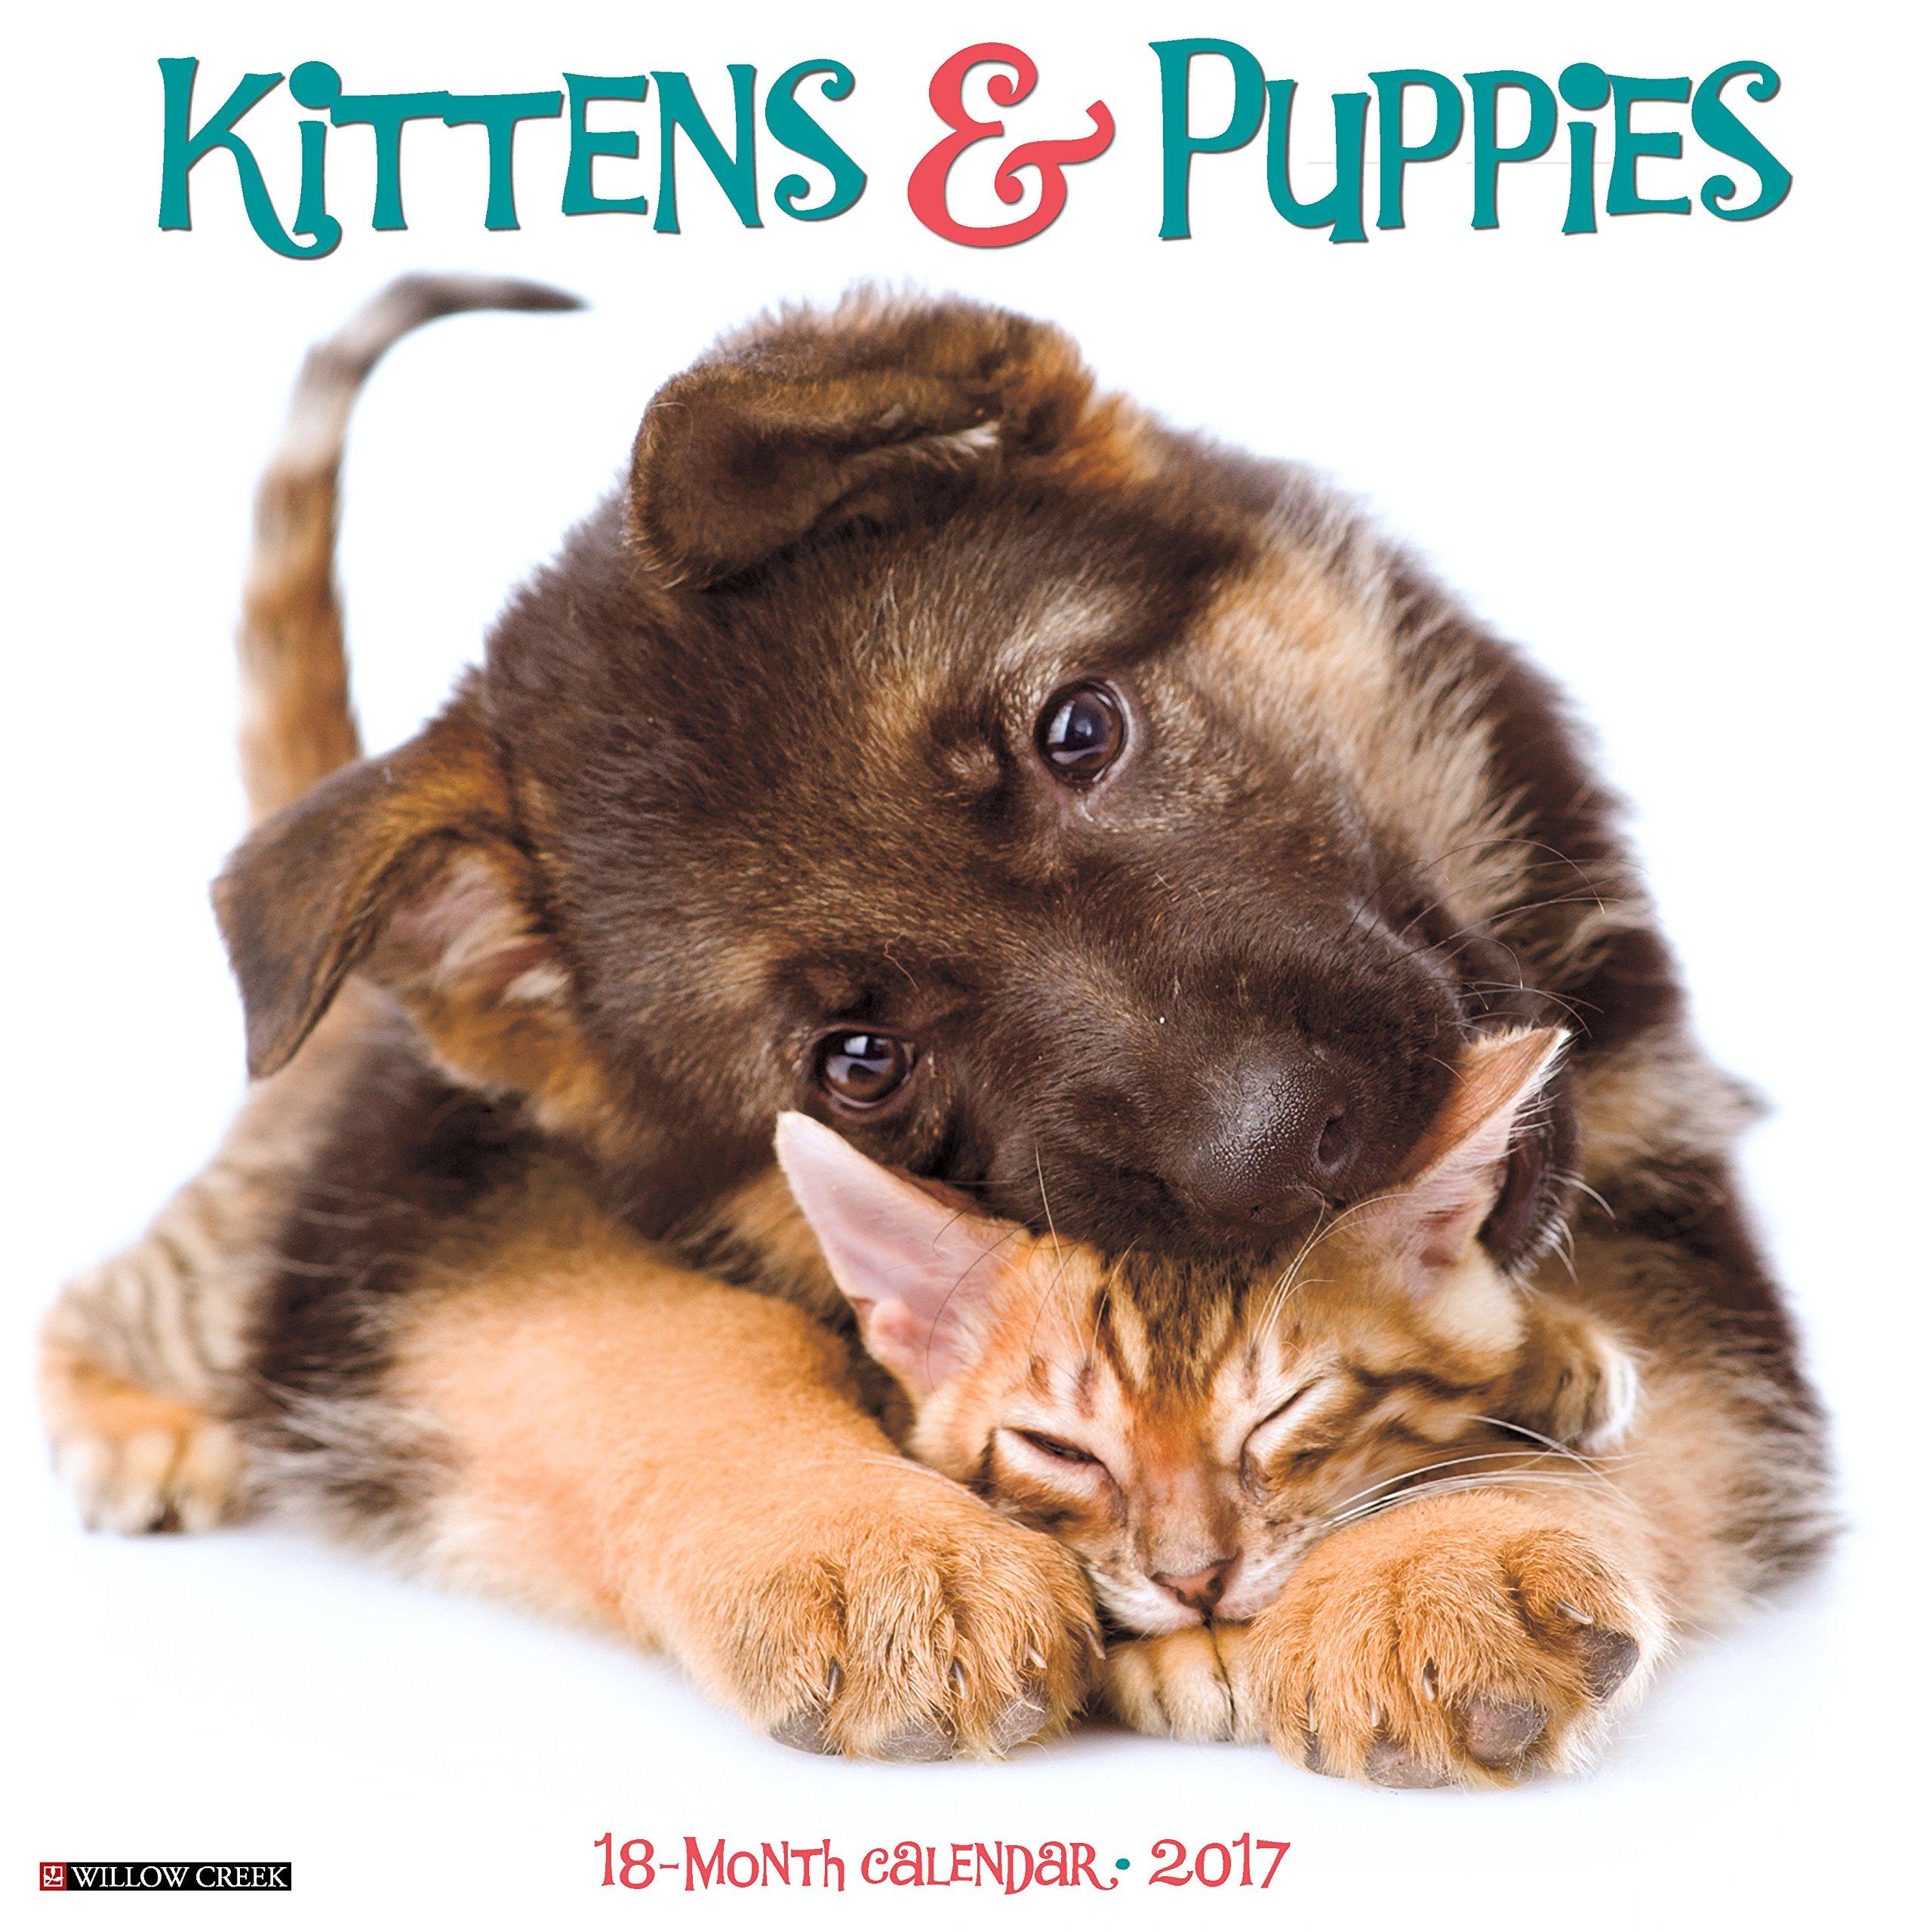 Amazon Kittens & Puppies 2017 Wall Calendar